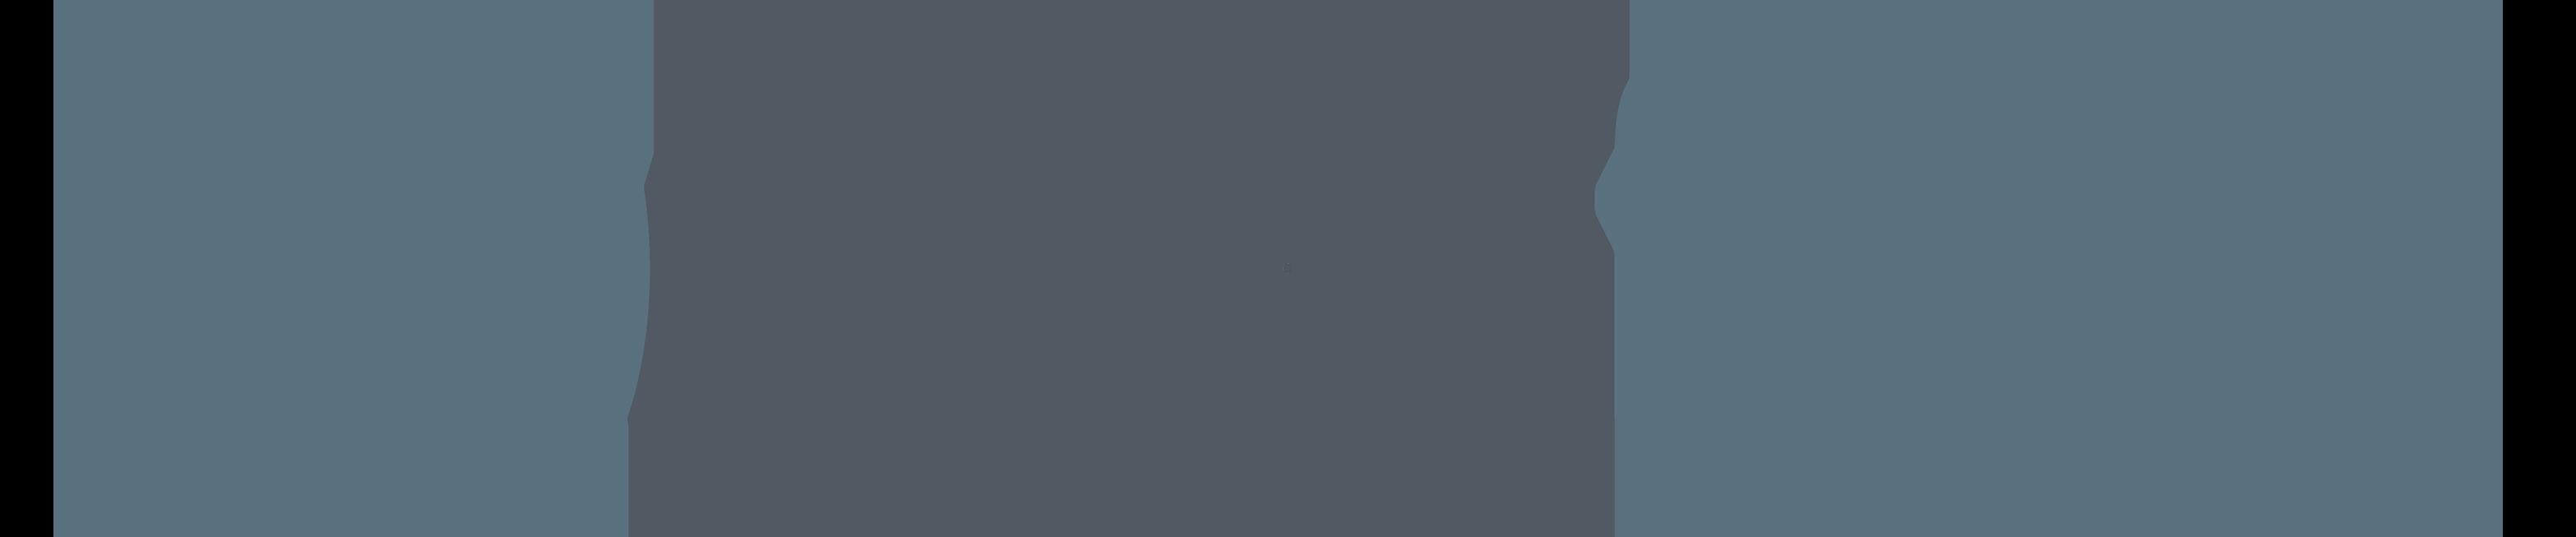 Medfyle